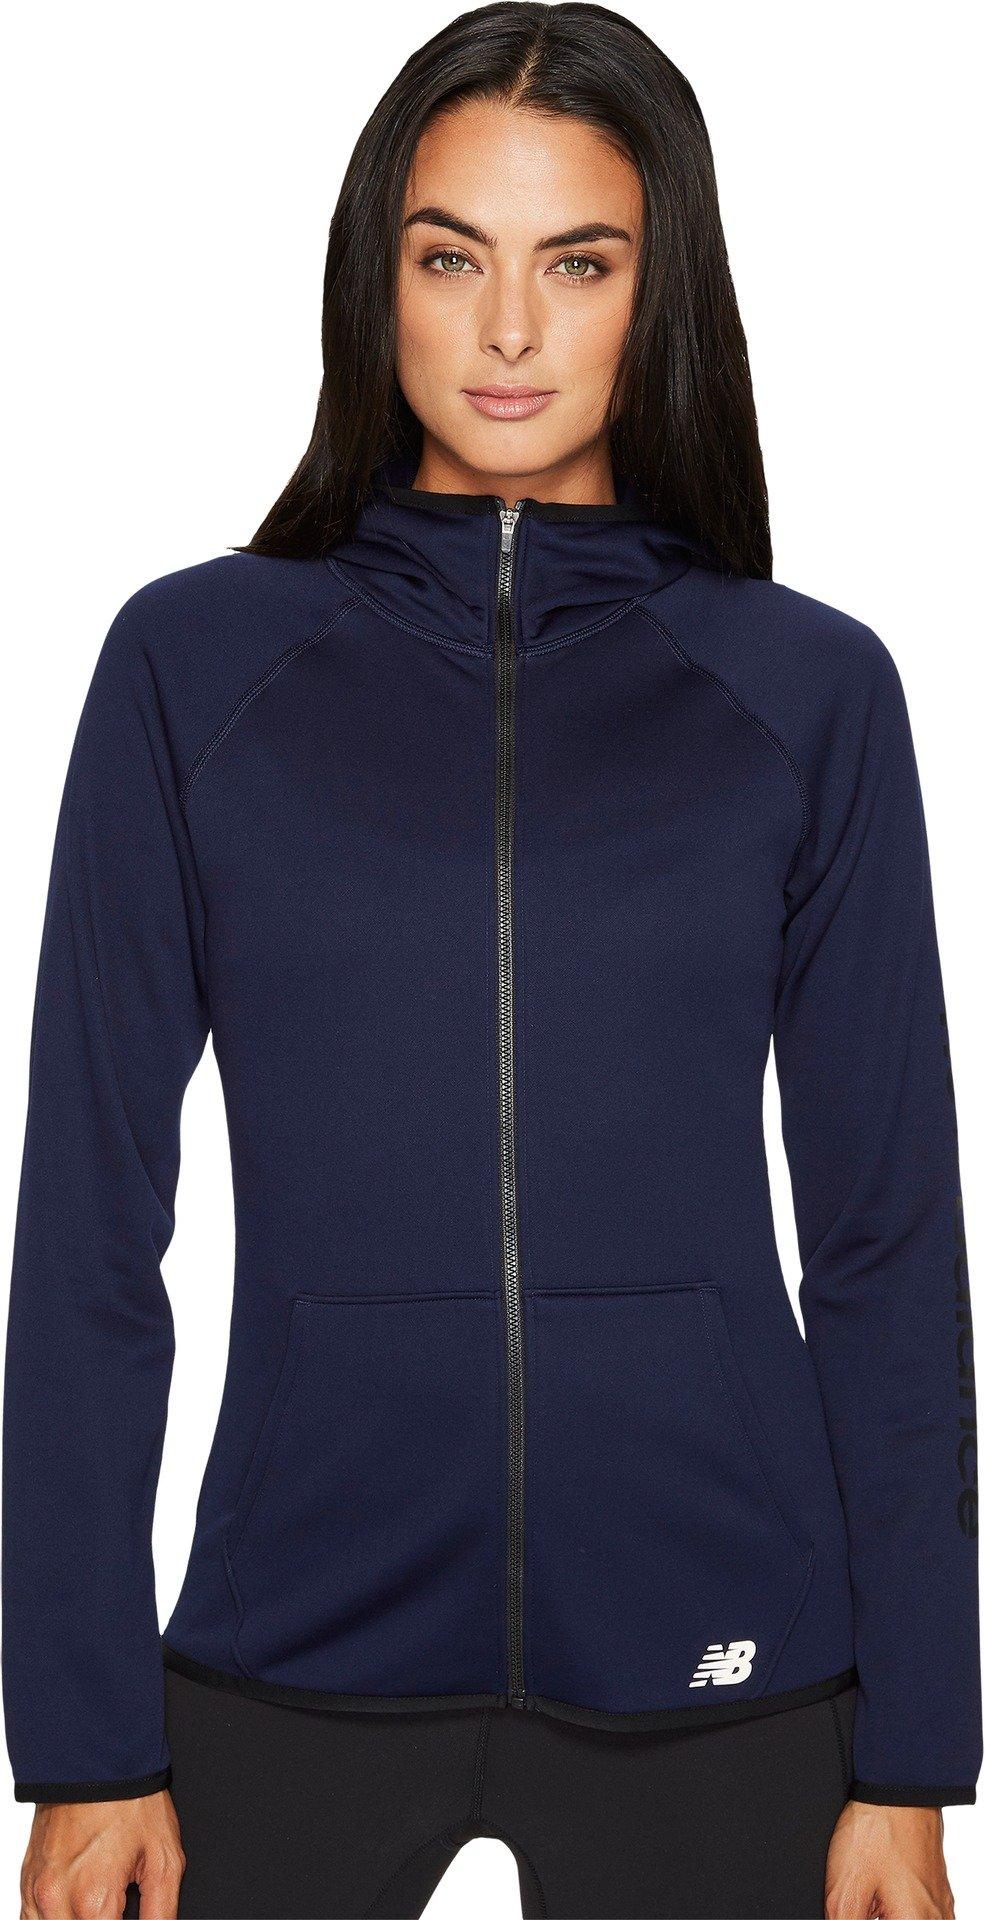 New Balance Womens Accelerate Fleece Full Zip, Pigment, Medium